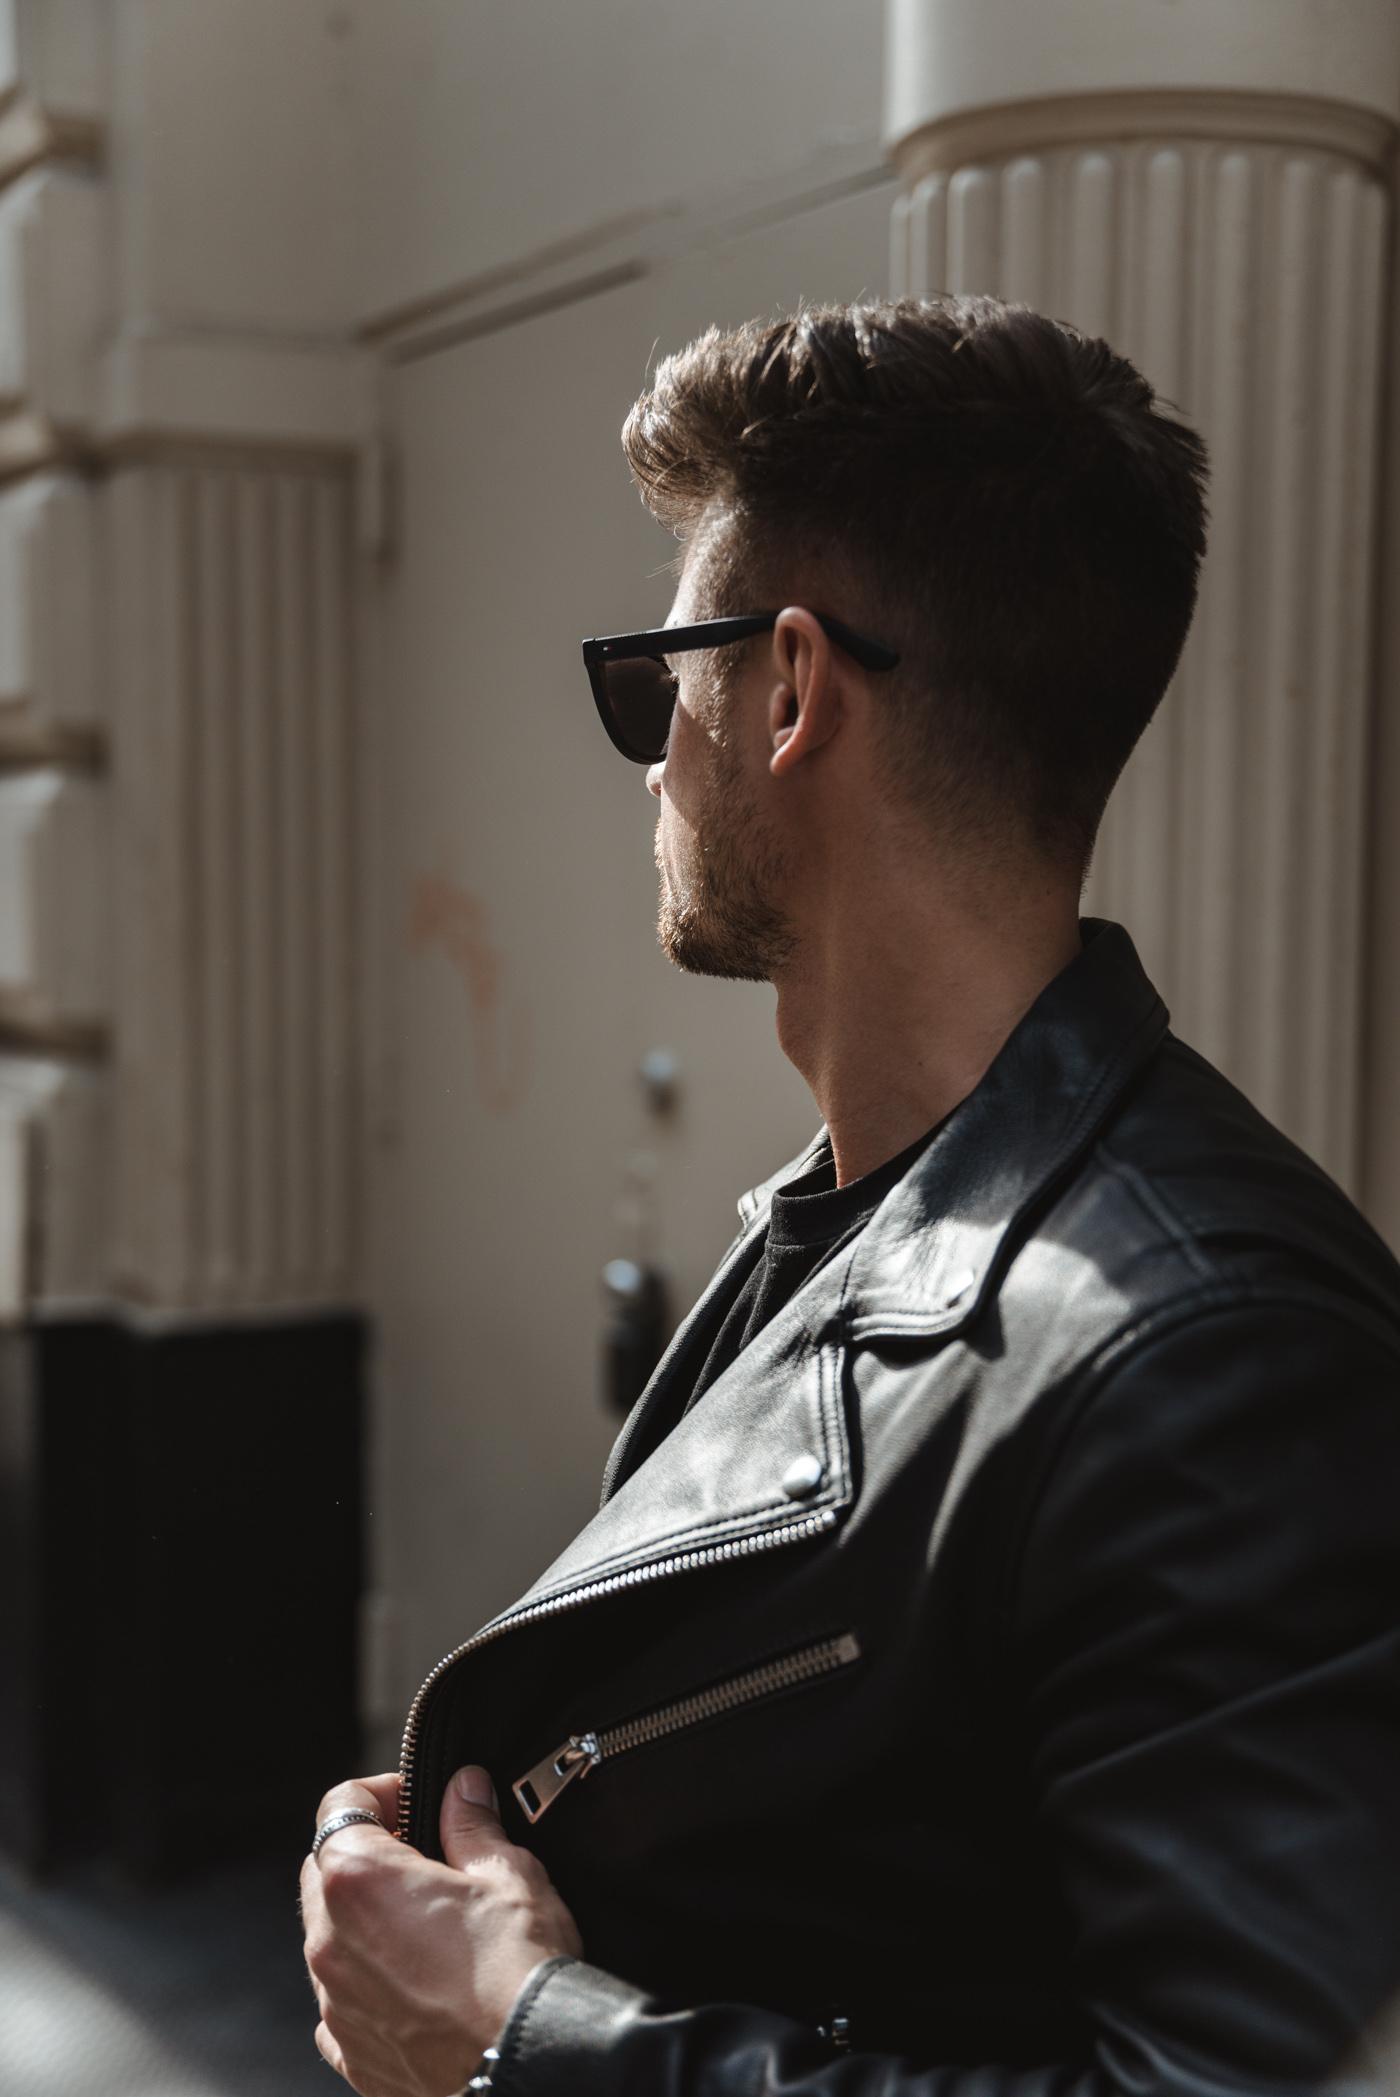 Tommeezjerry-Lifestyleblog-Fashionblog-Maennermodeblog-Maennerblog-Modeblog-Mister-Spex-Tommy-Hilfiger-Glasses-Sunglasses-Casual-Brillen-Moderngentleman